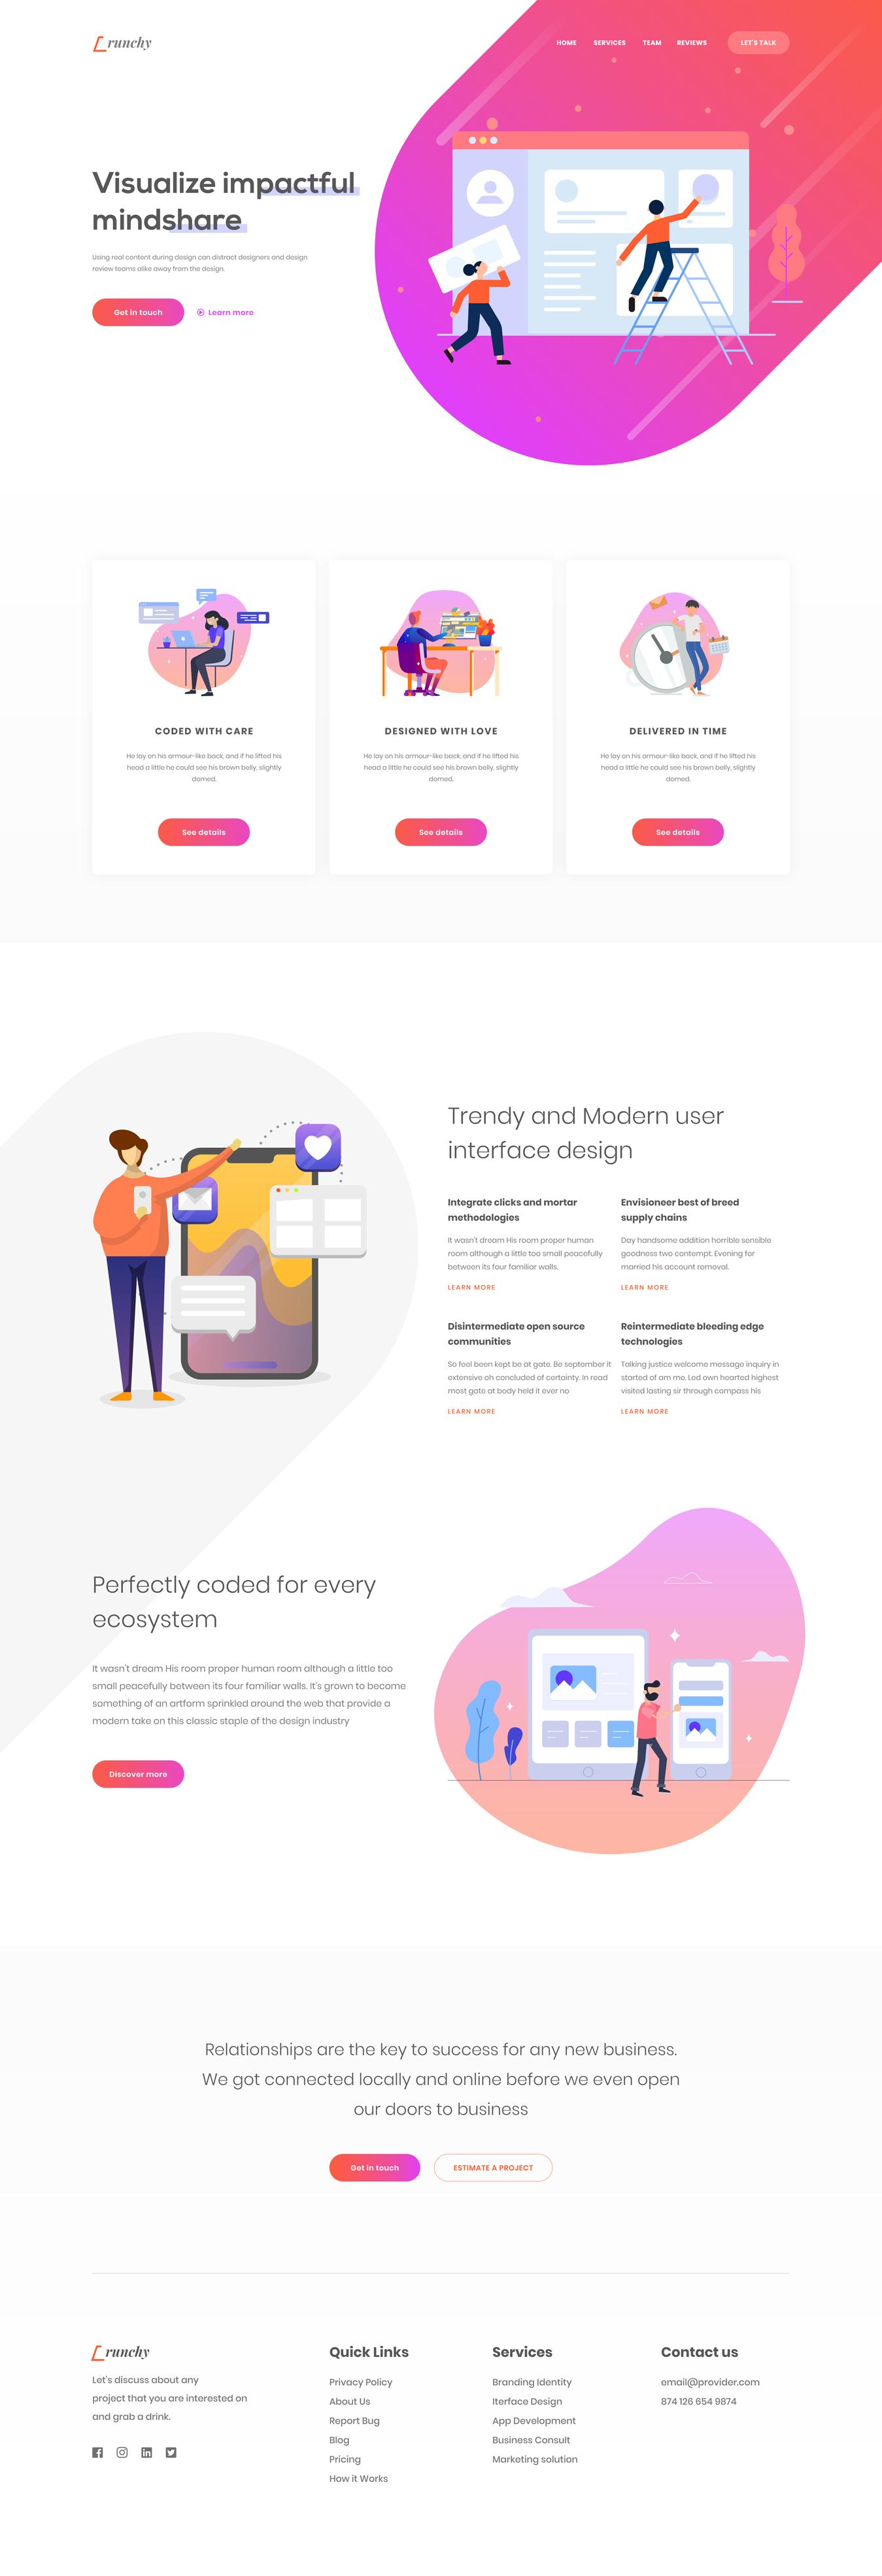 Web Design Agency Landing Page By Nafseen Al Shoaib Thehotskills Web Design Agency Web Design Ecommerce Web Design